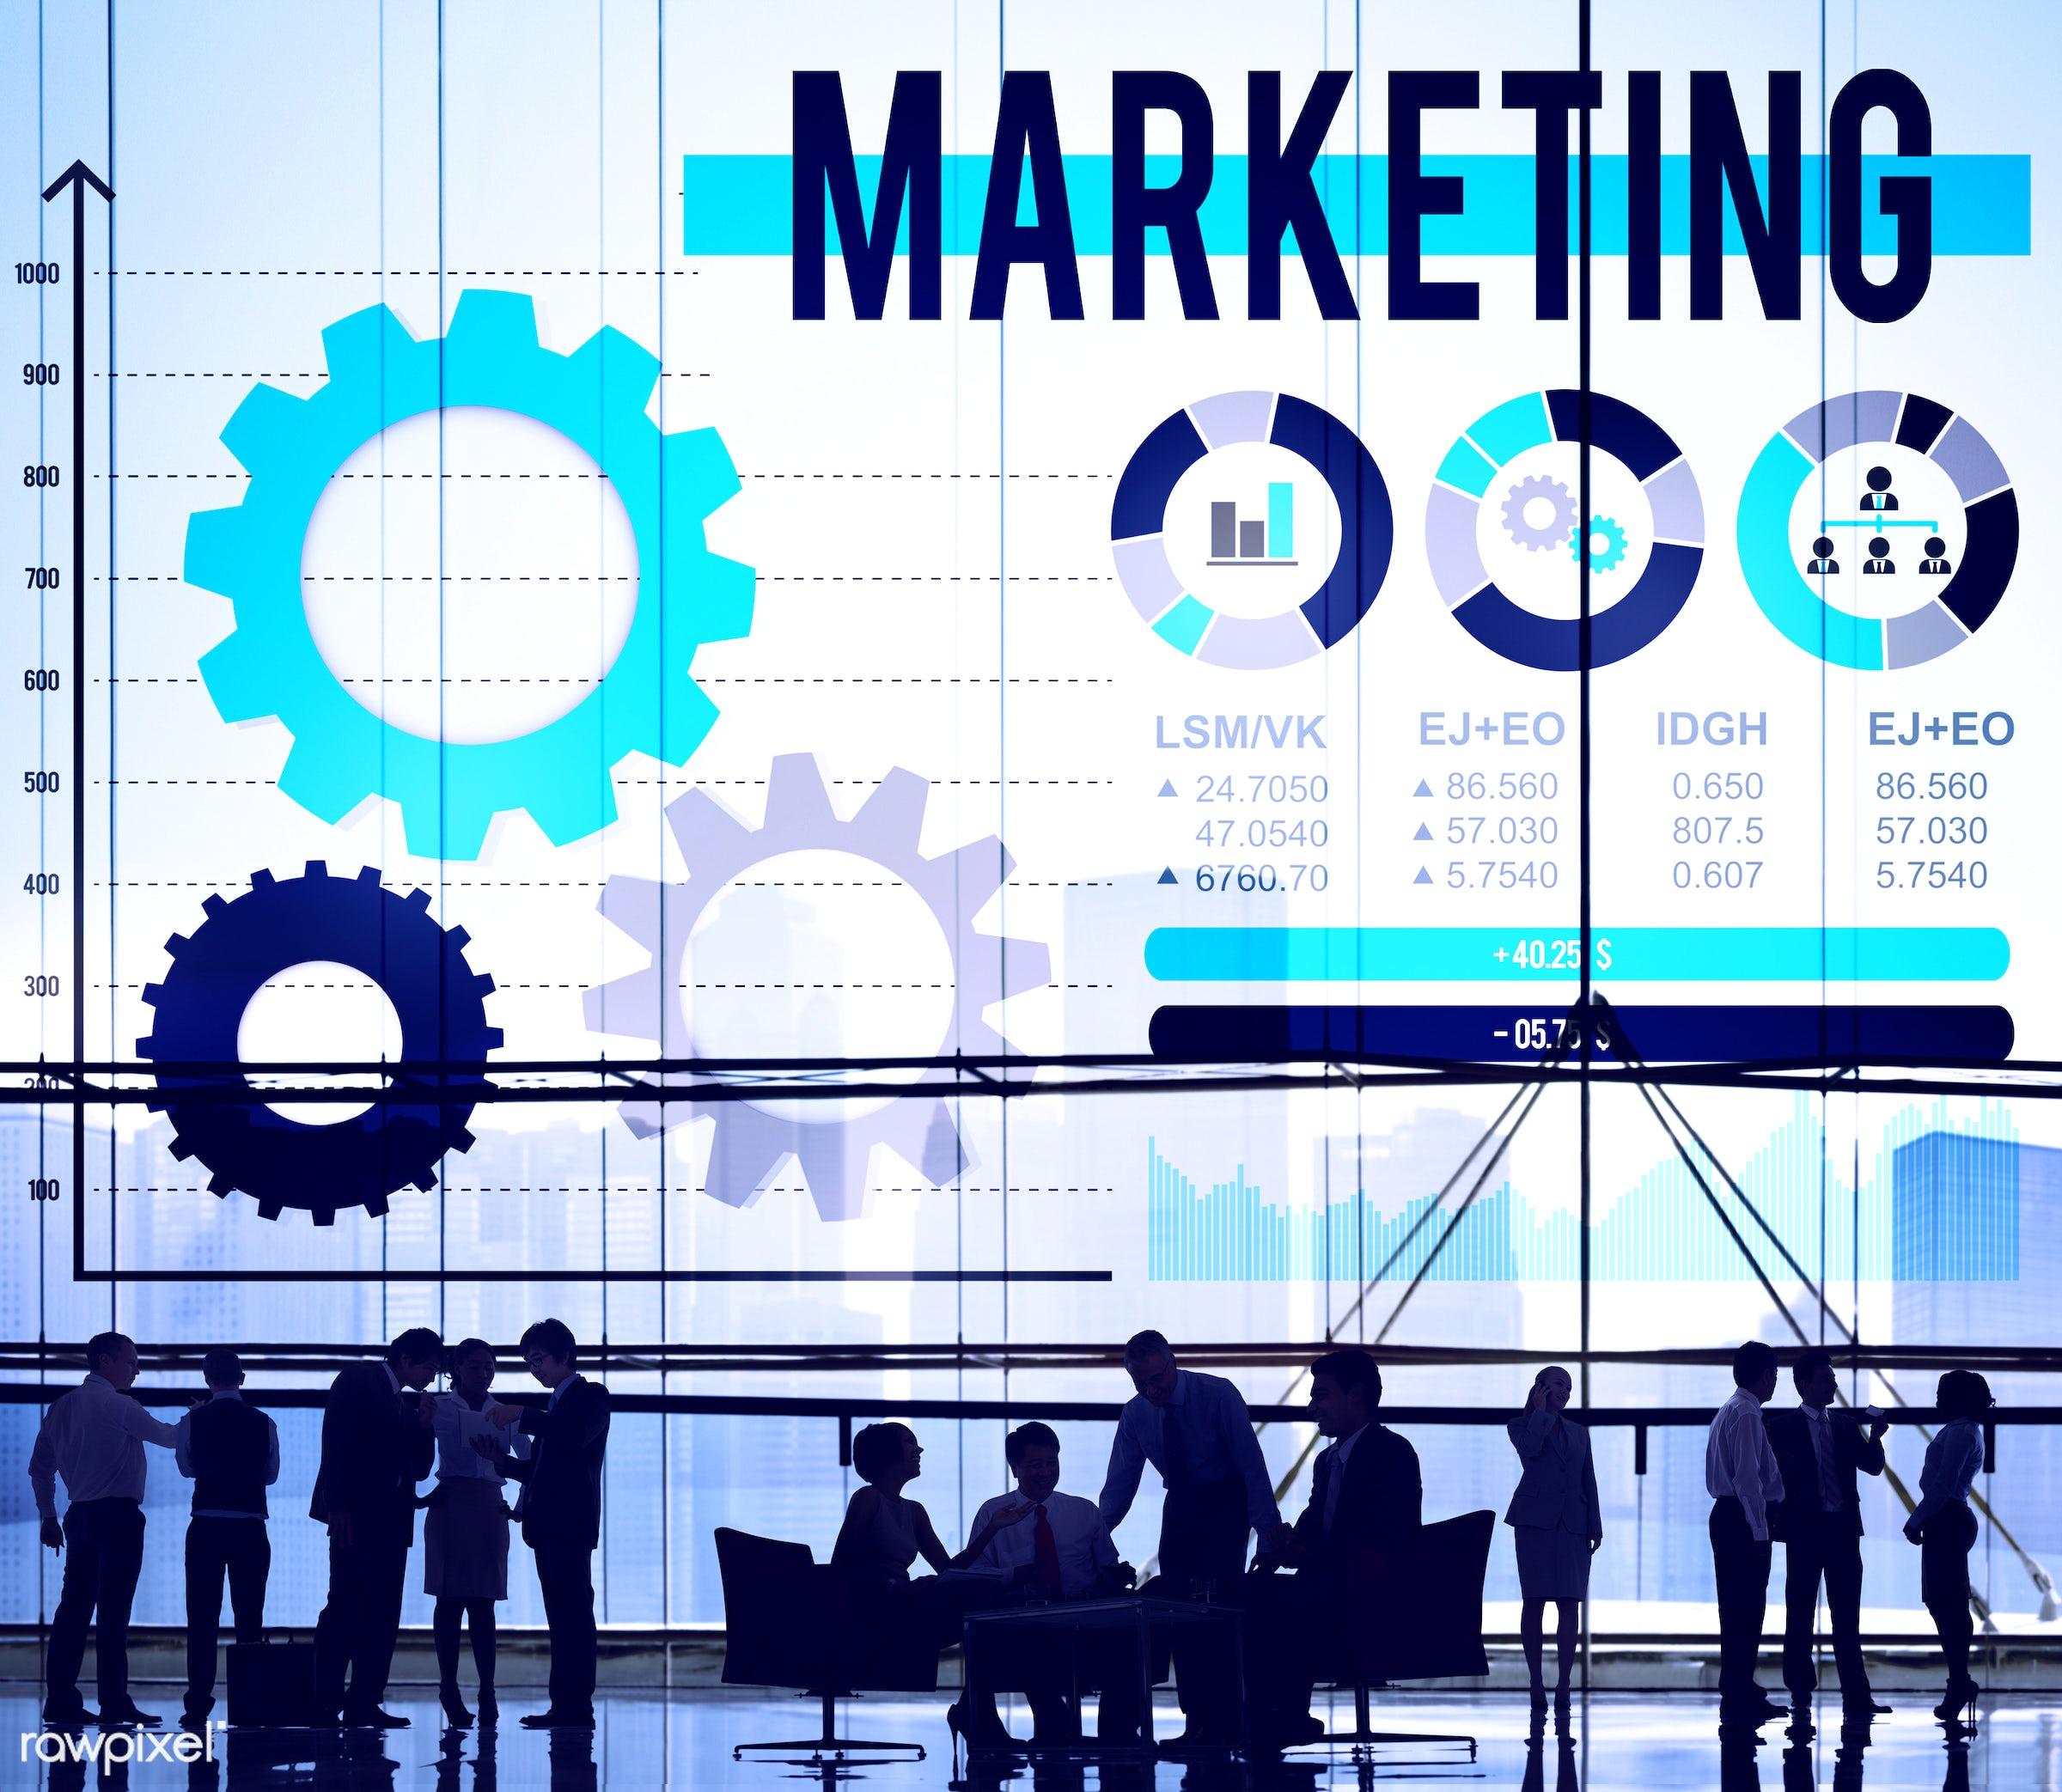 digital marketing, advertisement, advertising, analysis, brainstorming, branding, business, business people, businessmen,...